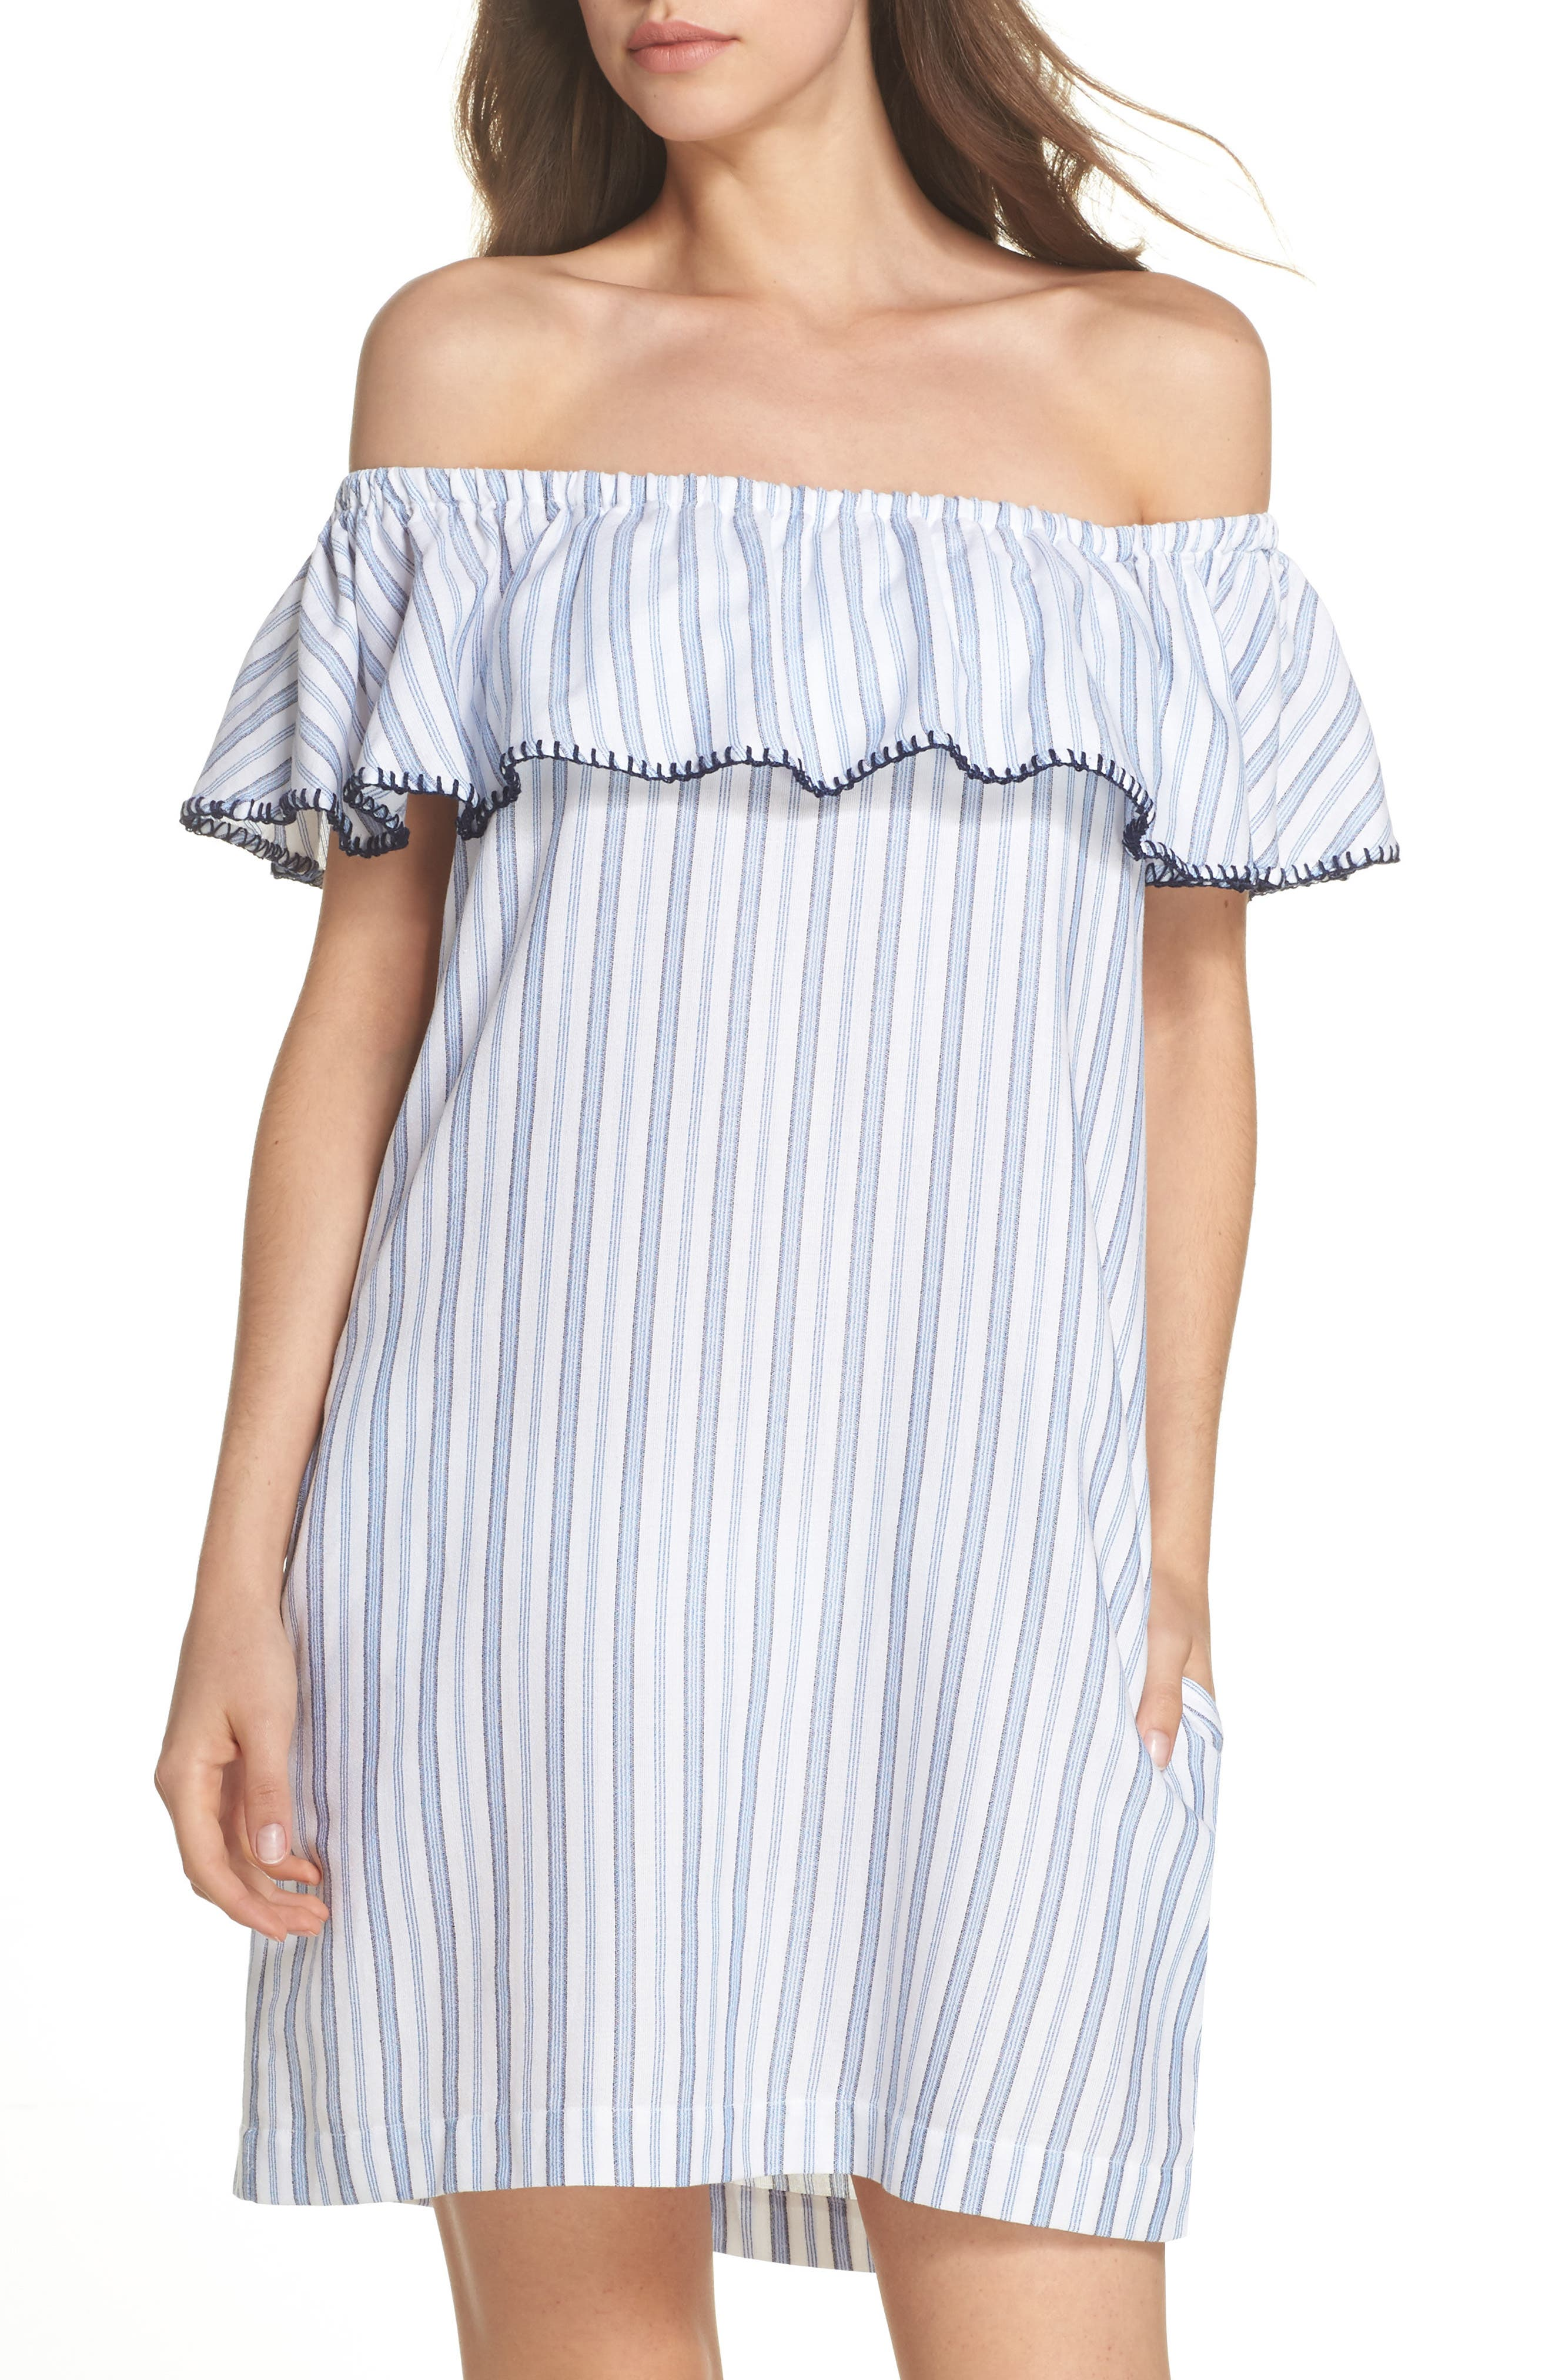 Ticking Stripe Off the Shoulder Cover-Up Dress,                         Main,                         color,